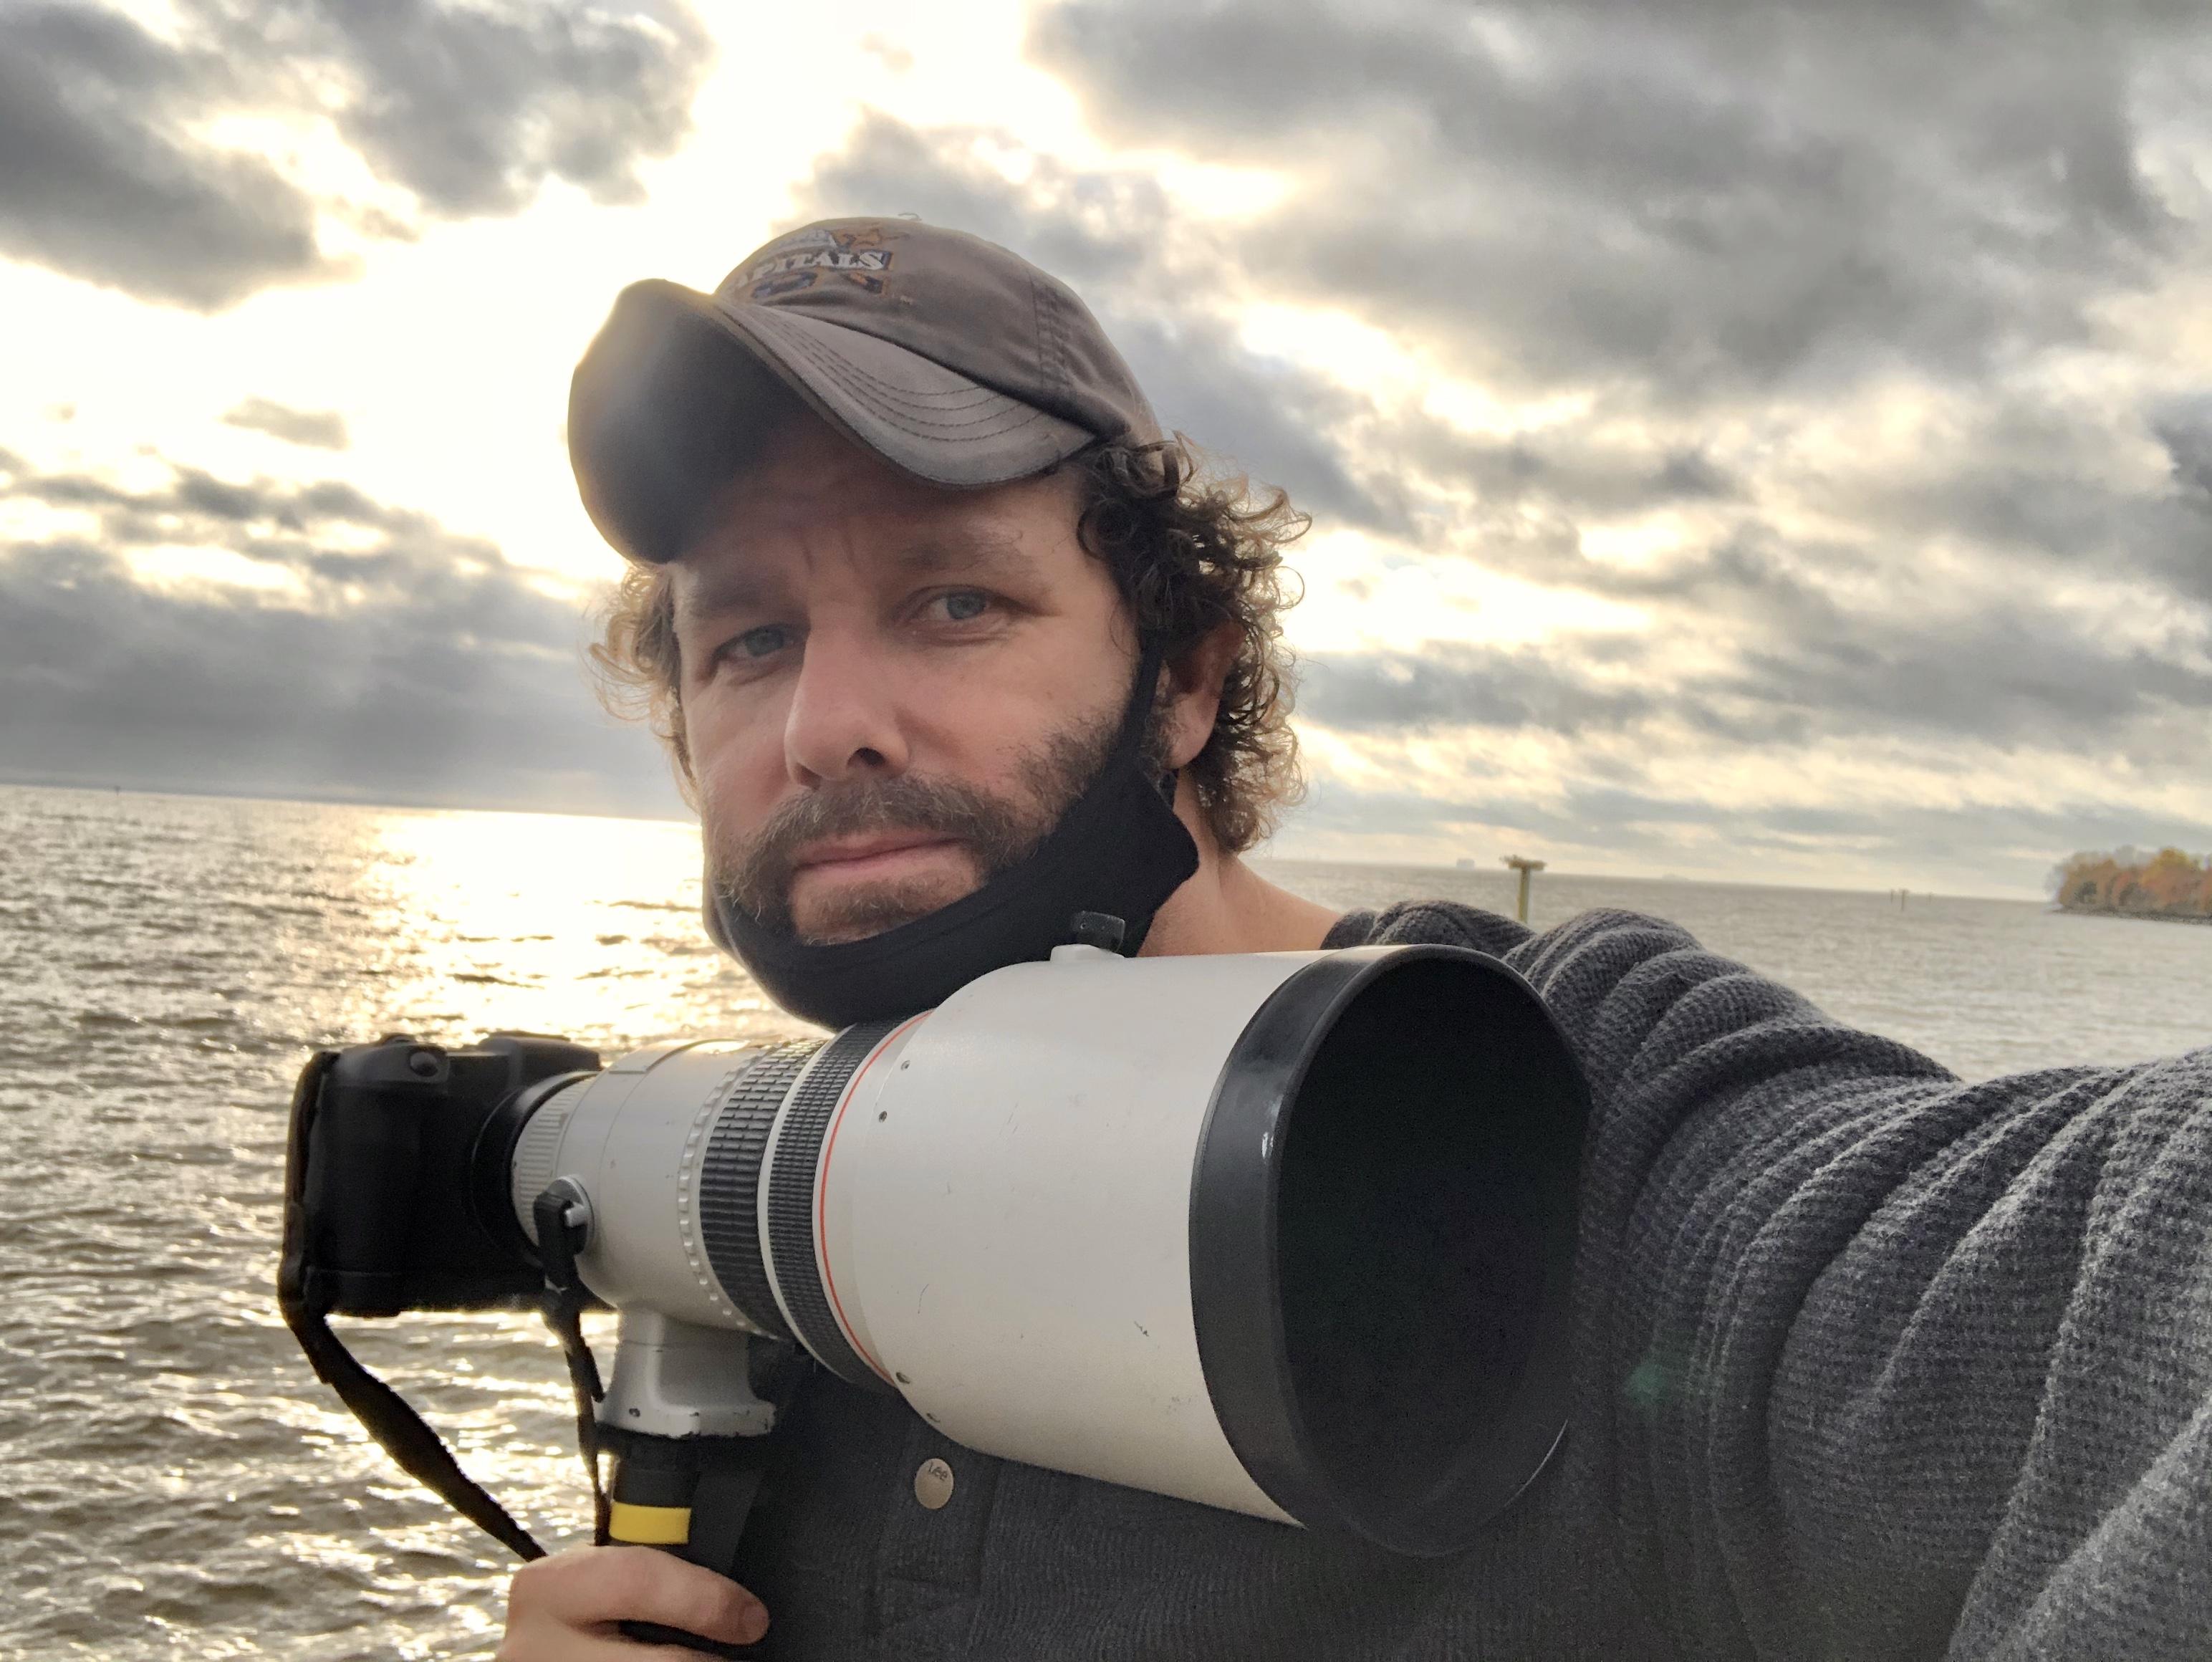 The photographer, Joshua McKerrow. Courtesy of Joshua McKerrow